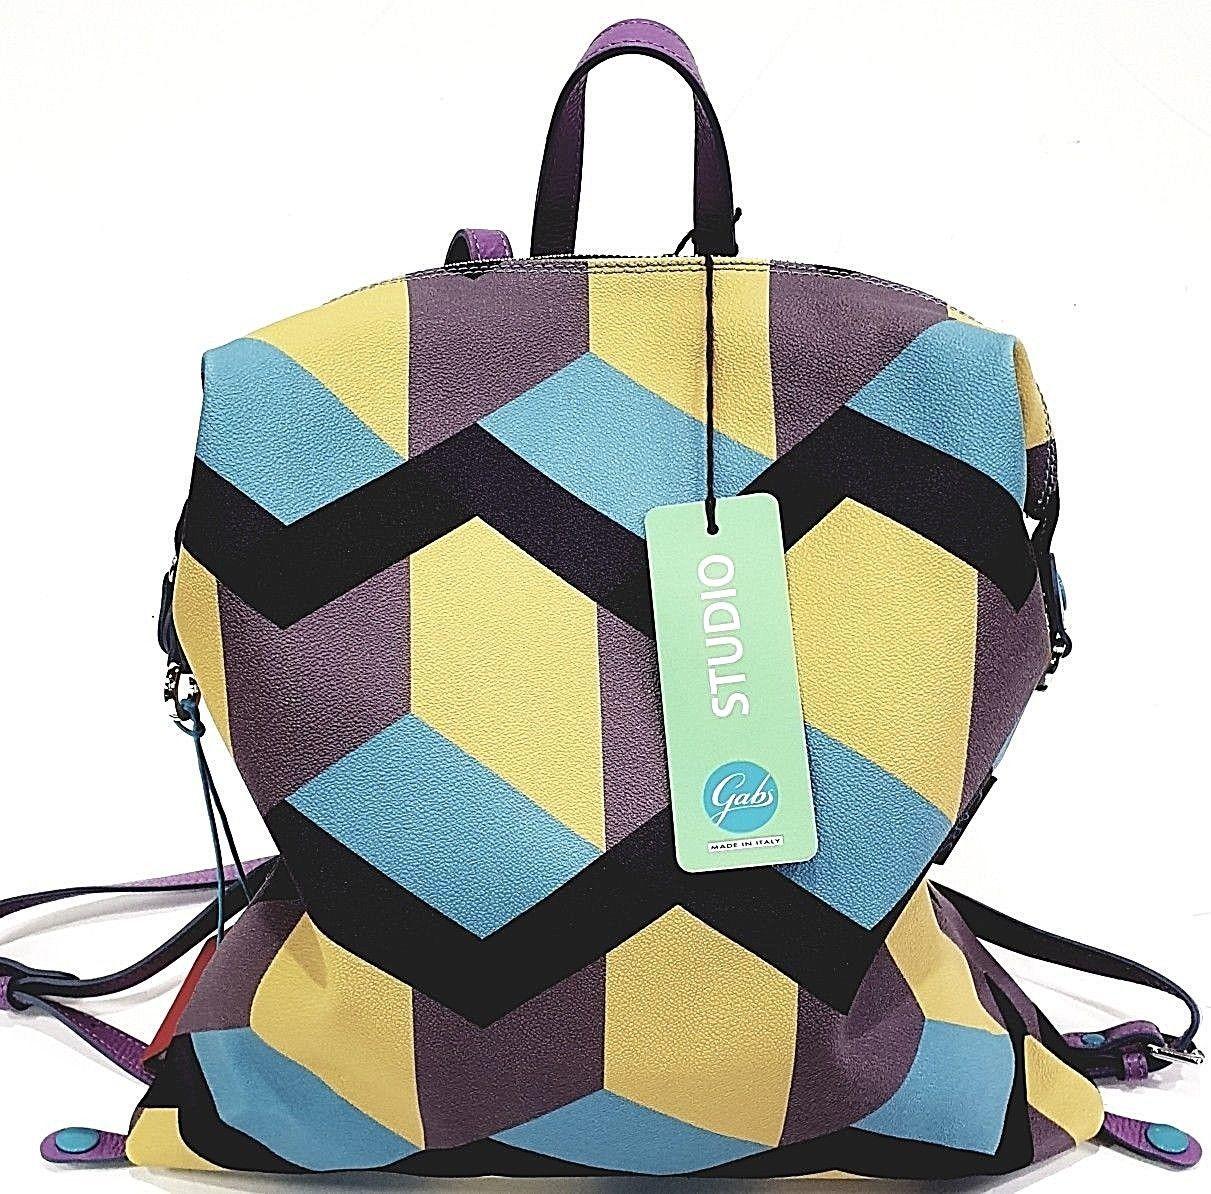 Zaino Gabs Shopping Piatto Tg.L Modello Lola Trasformabile Studio Fantasia 9dd637772d6